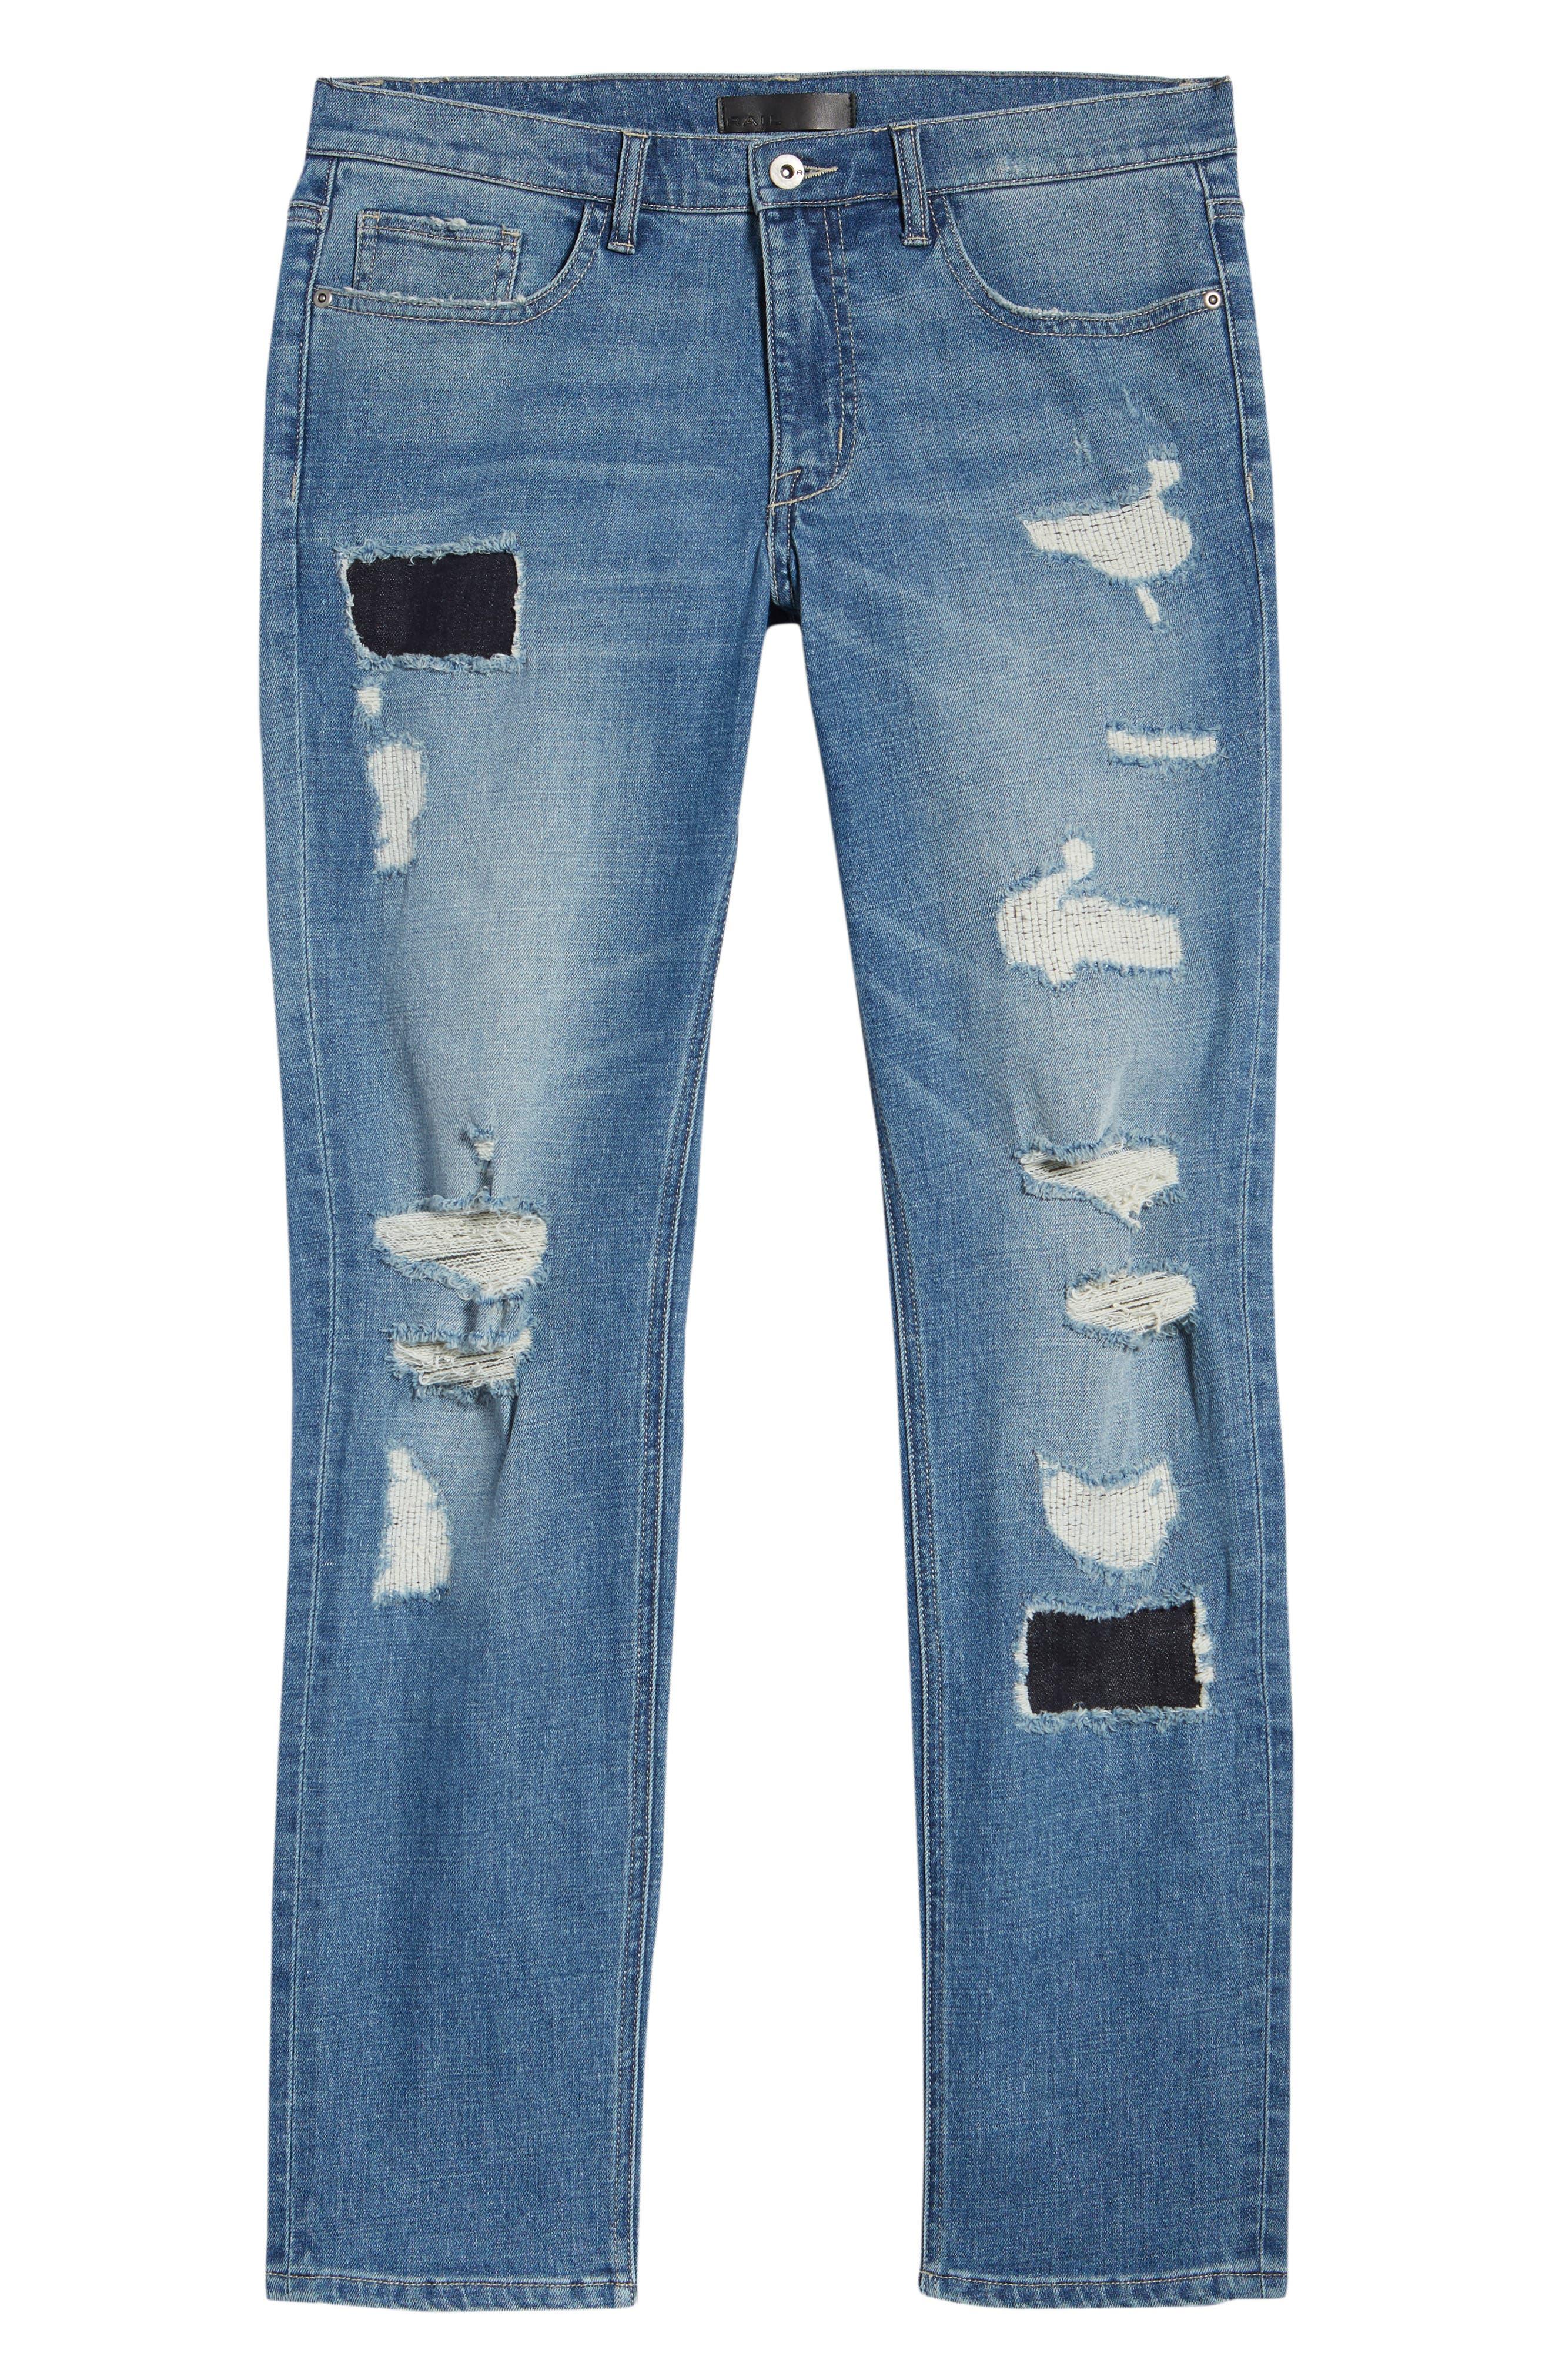 Rip & Repair Stretch Slim Jeans,                             Alternate thumbnail 6, color,                             BLUE HETFIELD WASH